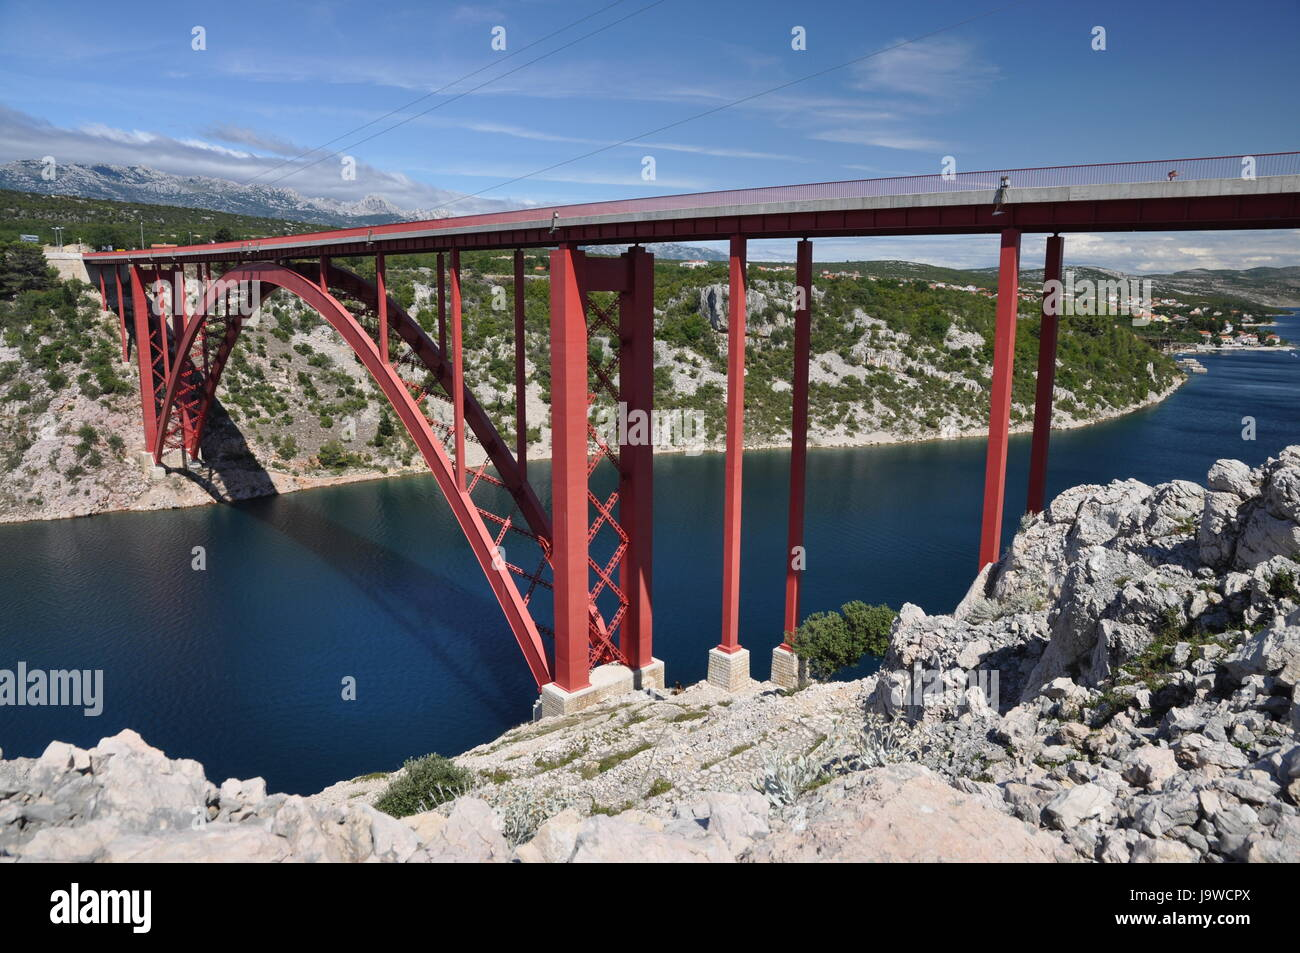 bridge, valley, croatia, red, traffic, transportation, road traffic, bay, Stock Photo